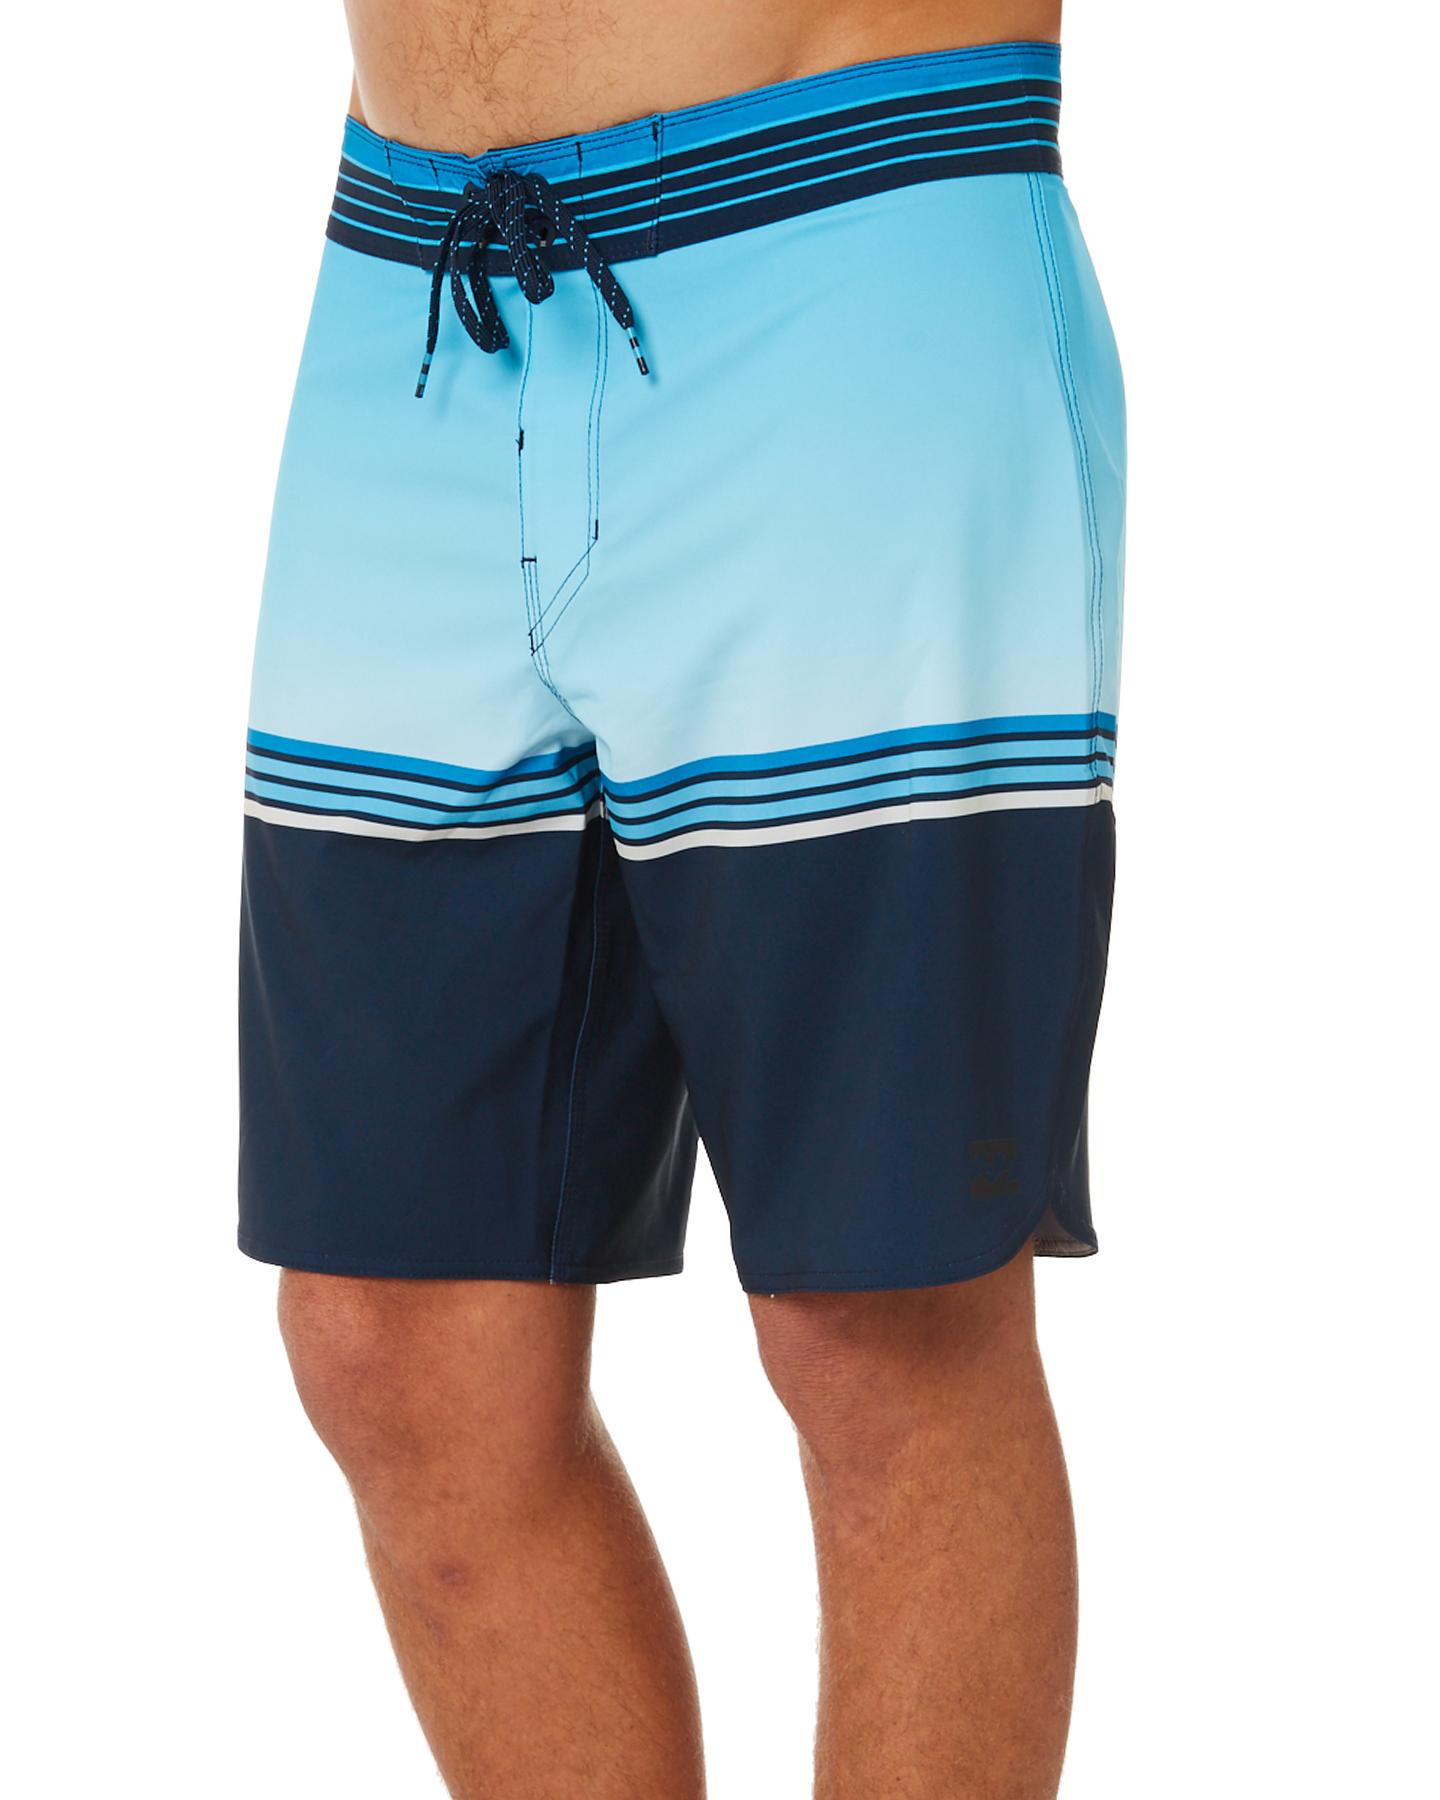 5688989be3 New Billabong Men's Fifty50 X Mens Boardshort Stretch Blue | eBay